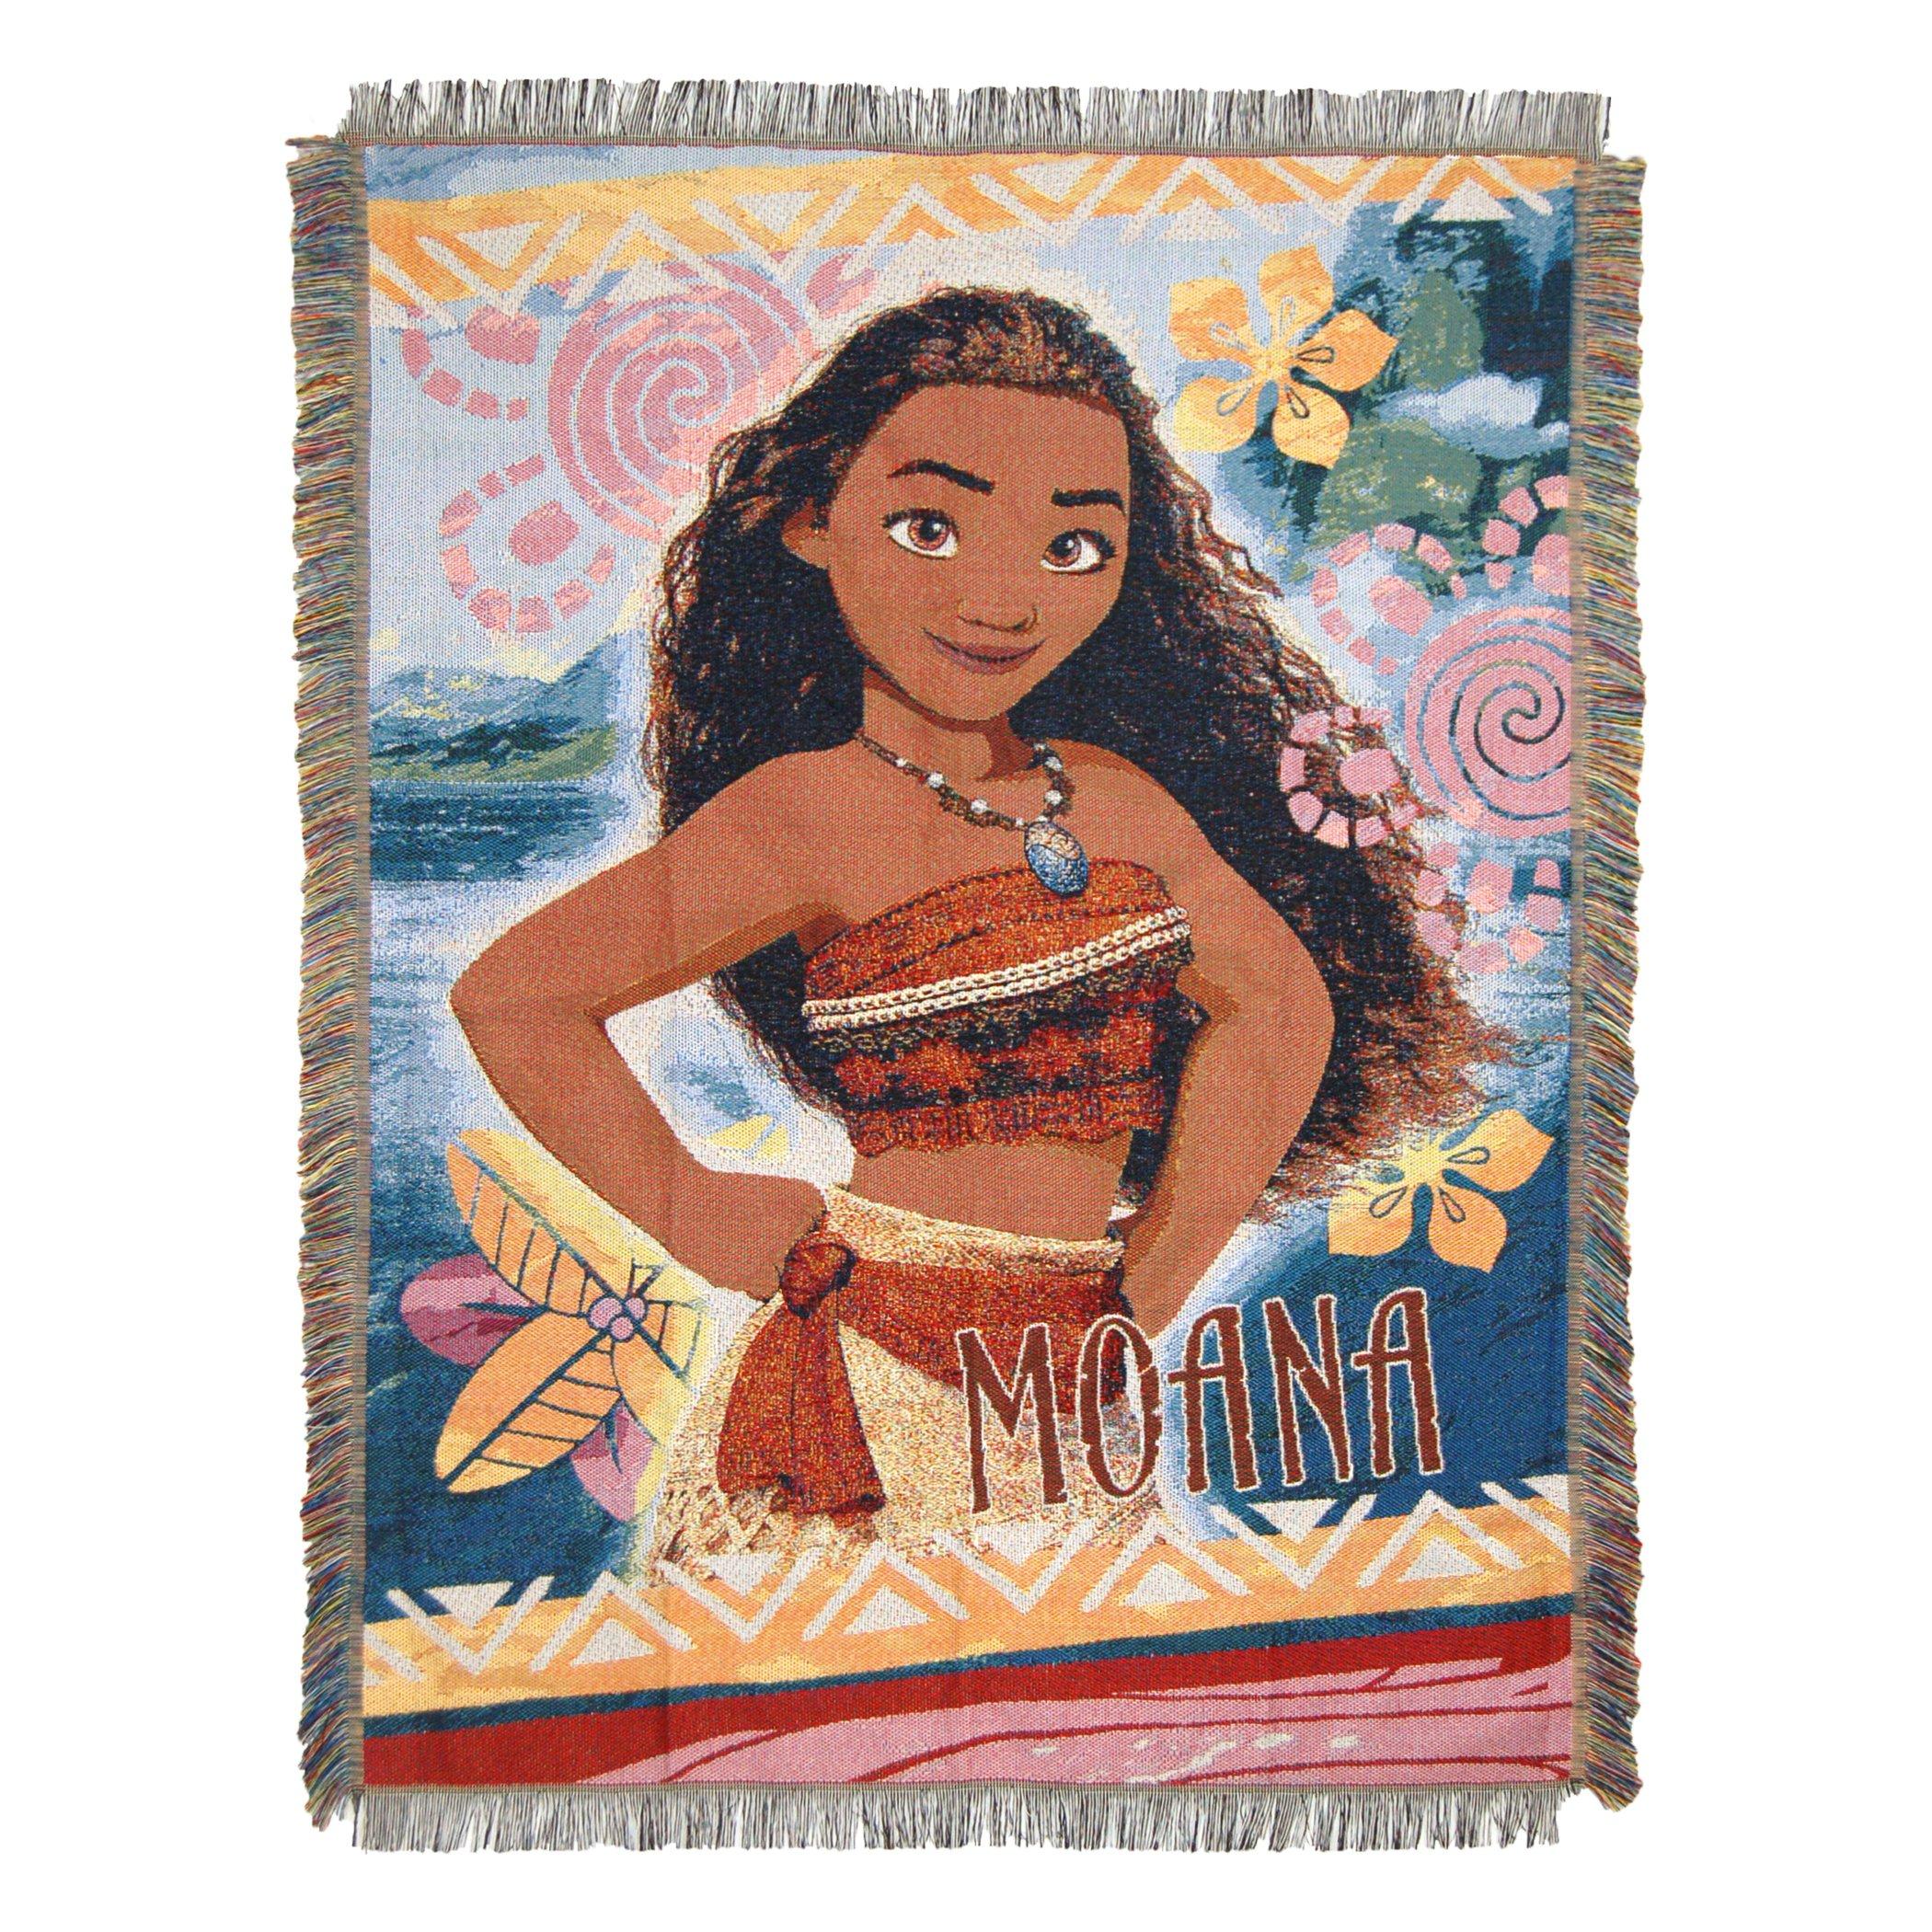 Disney Moana,Island Girl Woven Tapestry Throw Blanket, 48'' x 60''